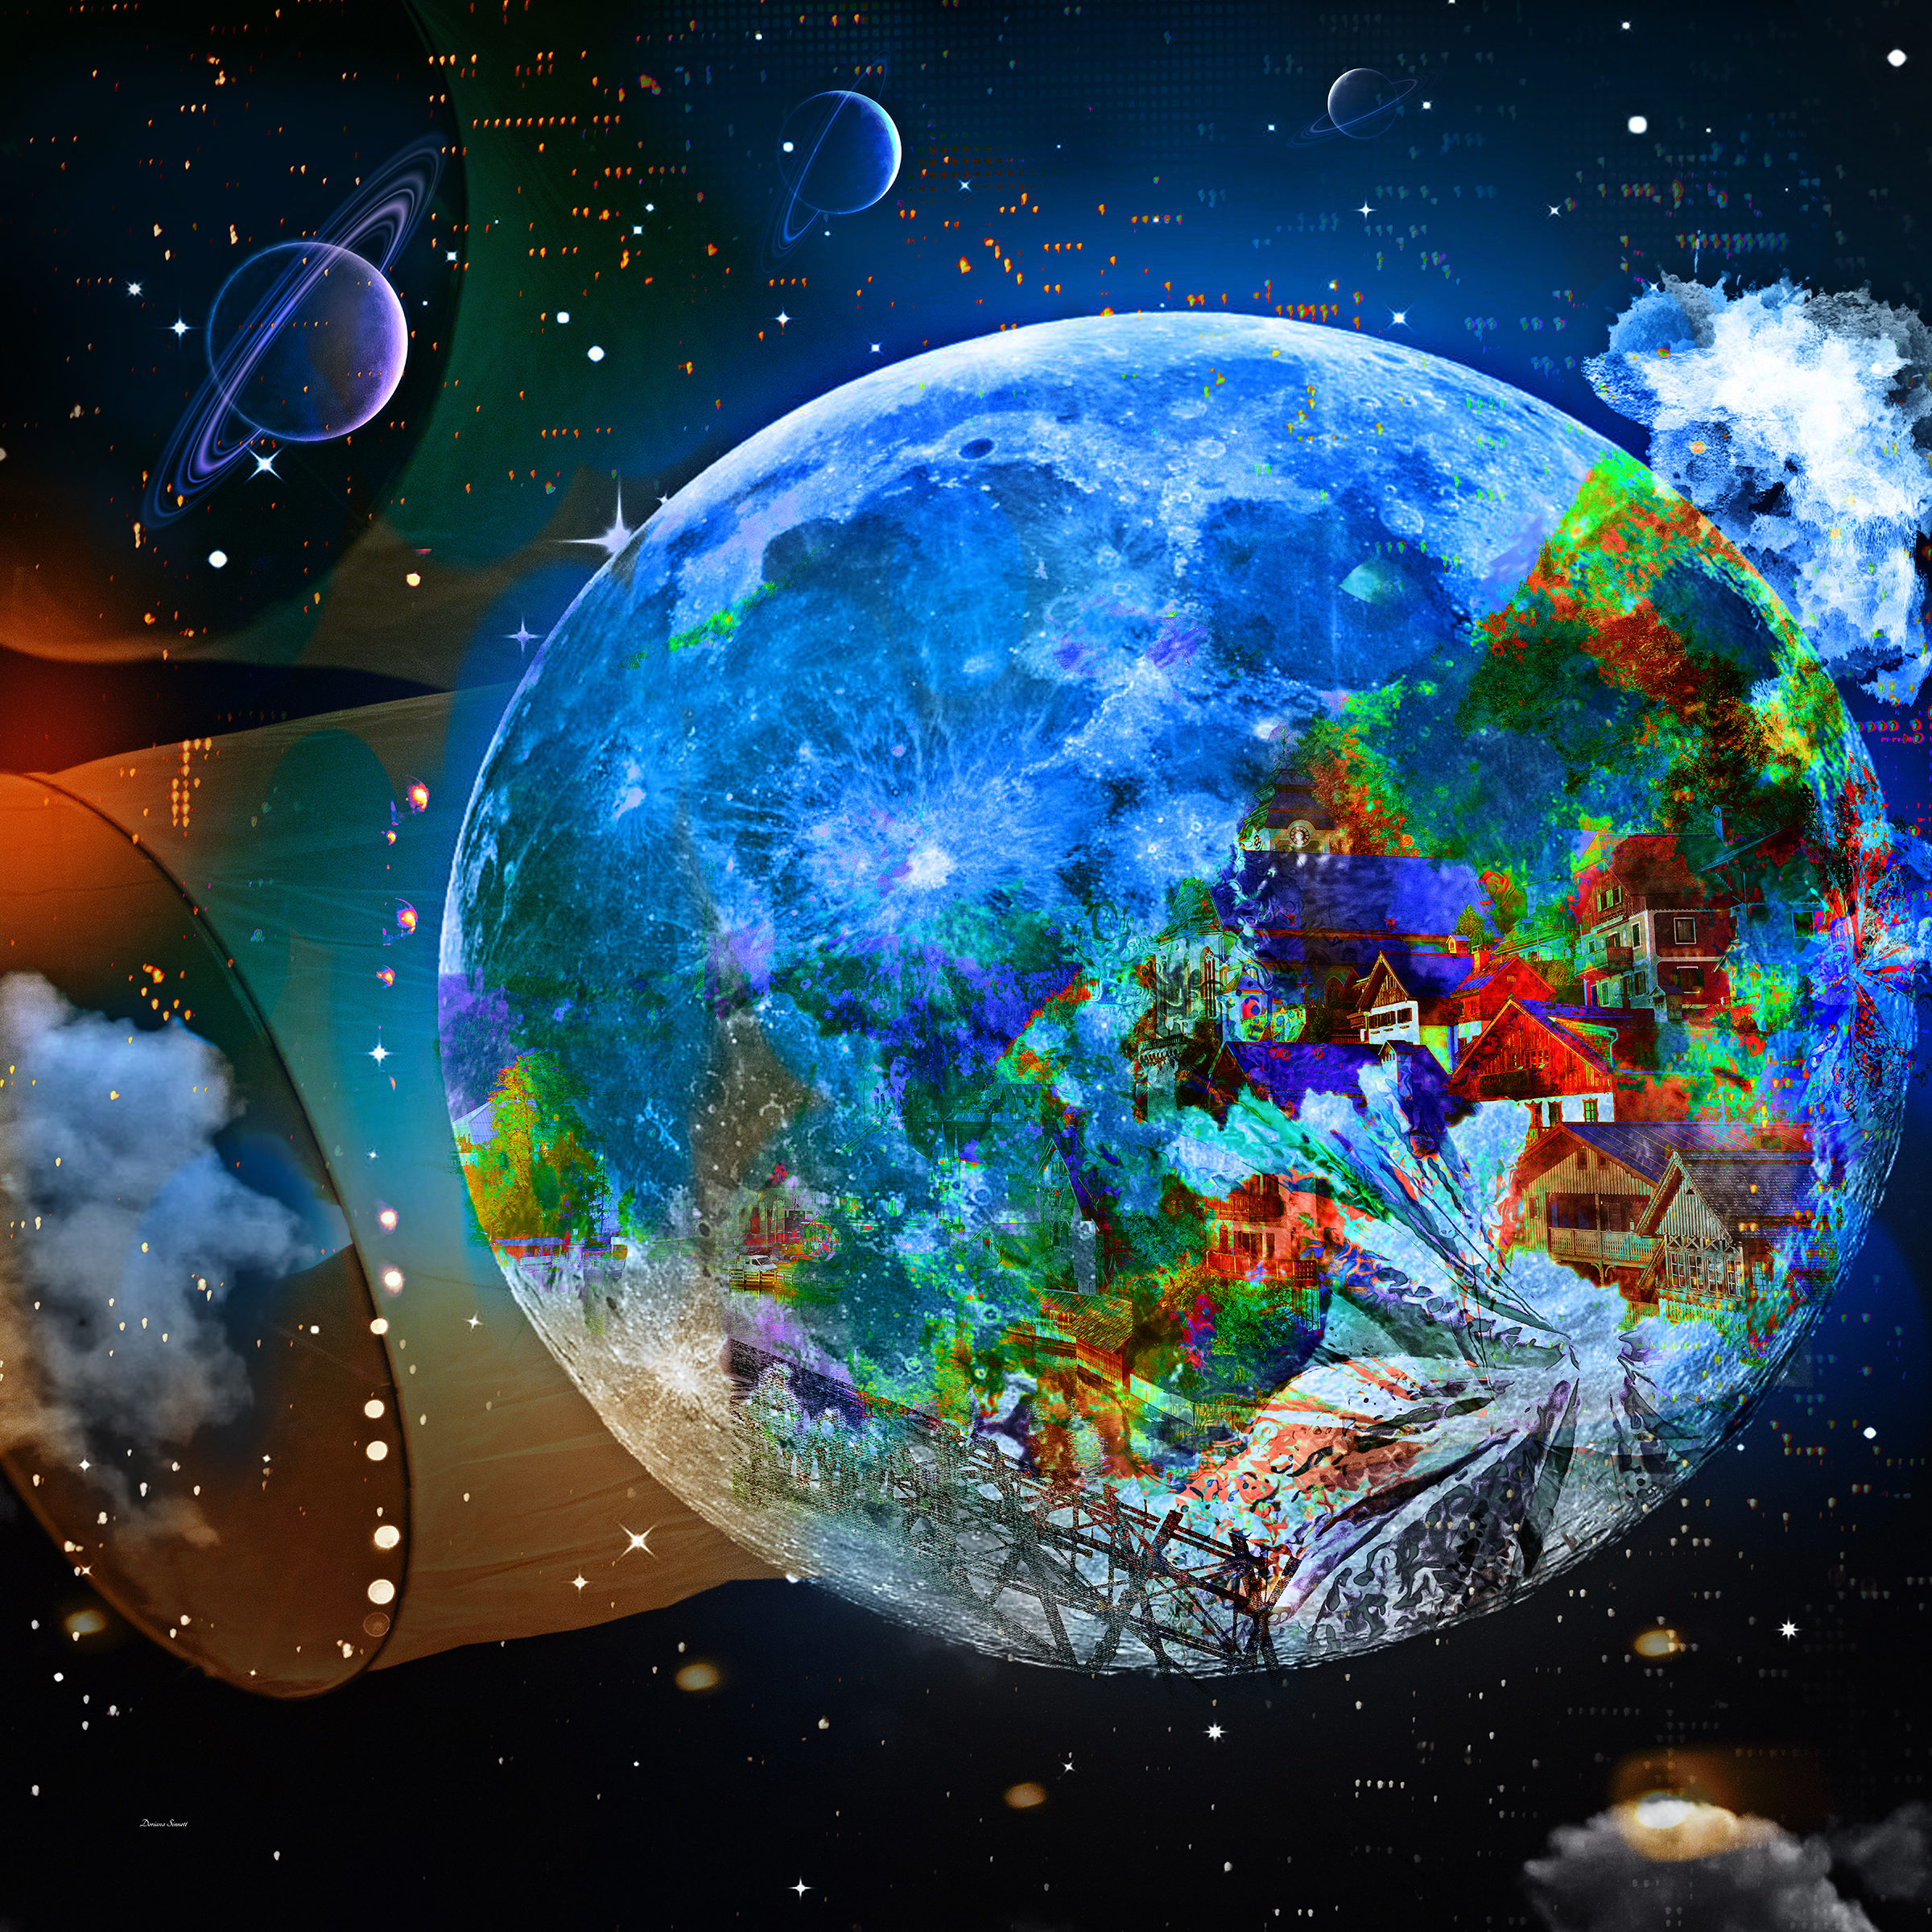 Interplanetary Mission…BUY  https://artboja.com/art/38vvy2/19836.php